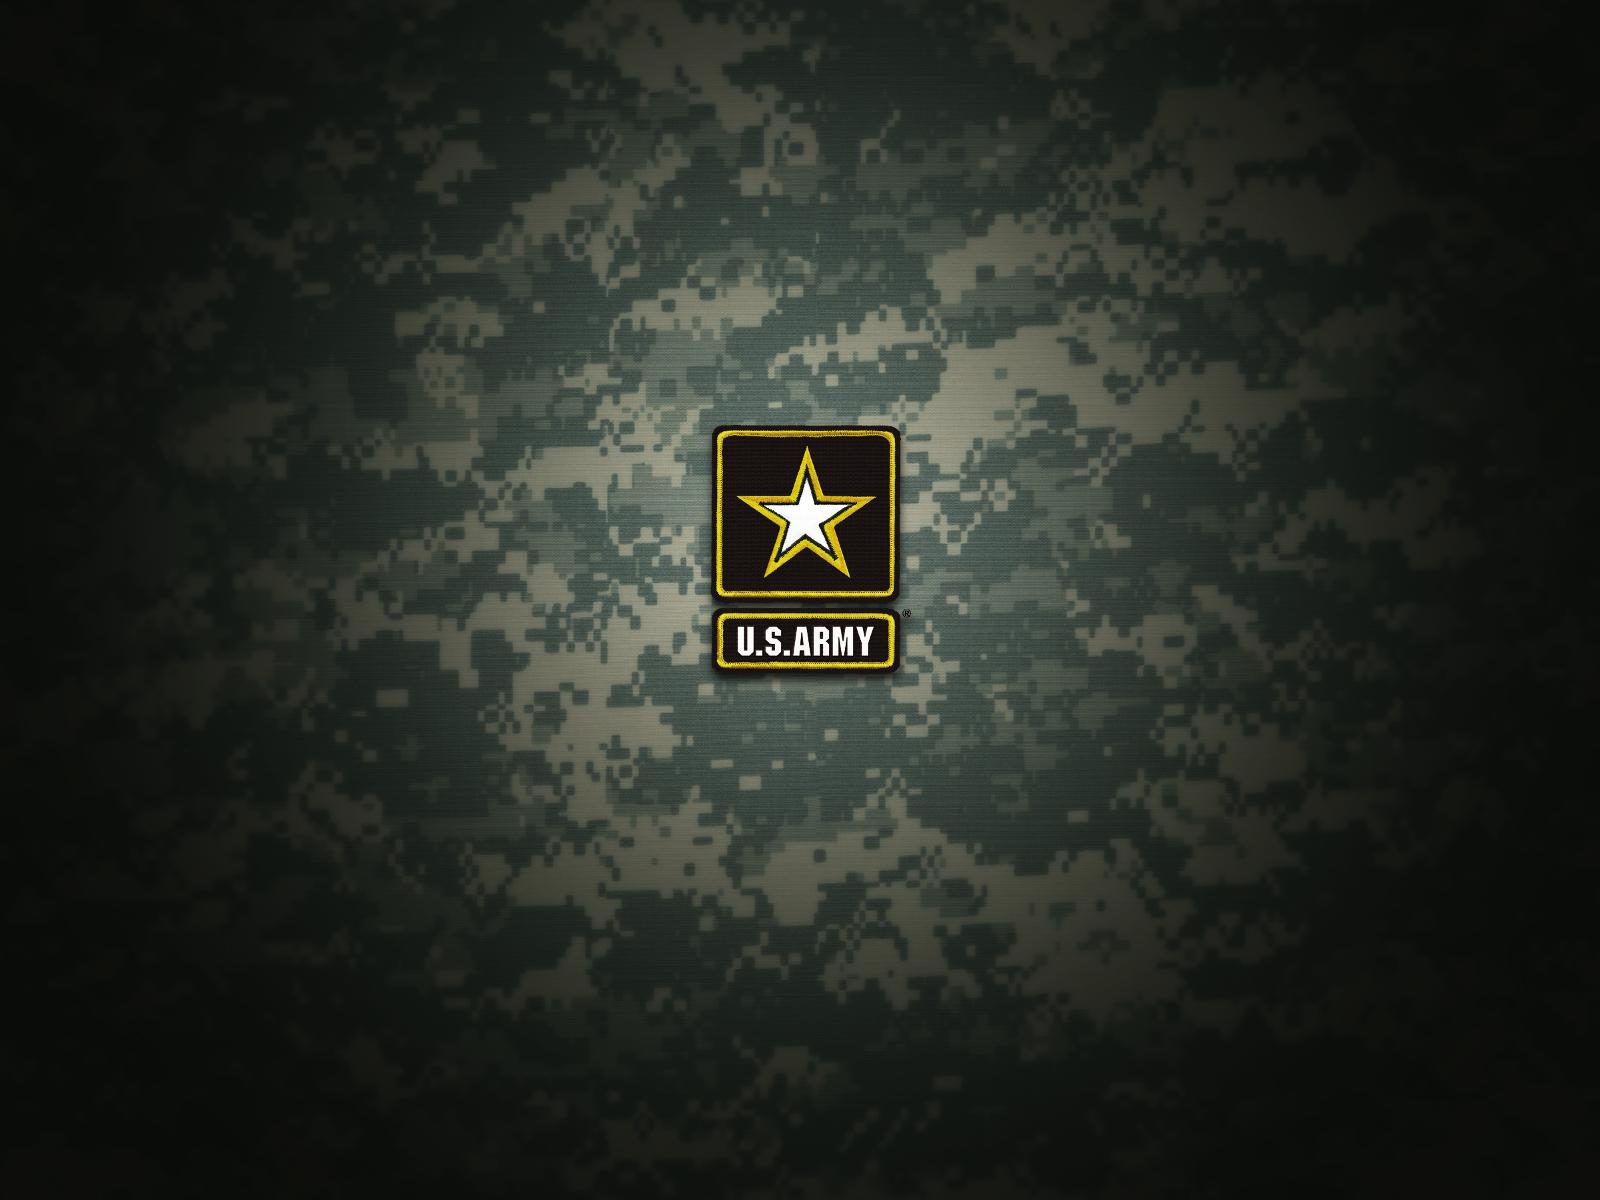 go army wallpaper - photo #3